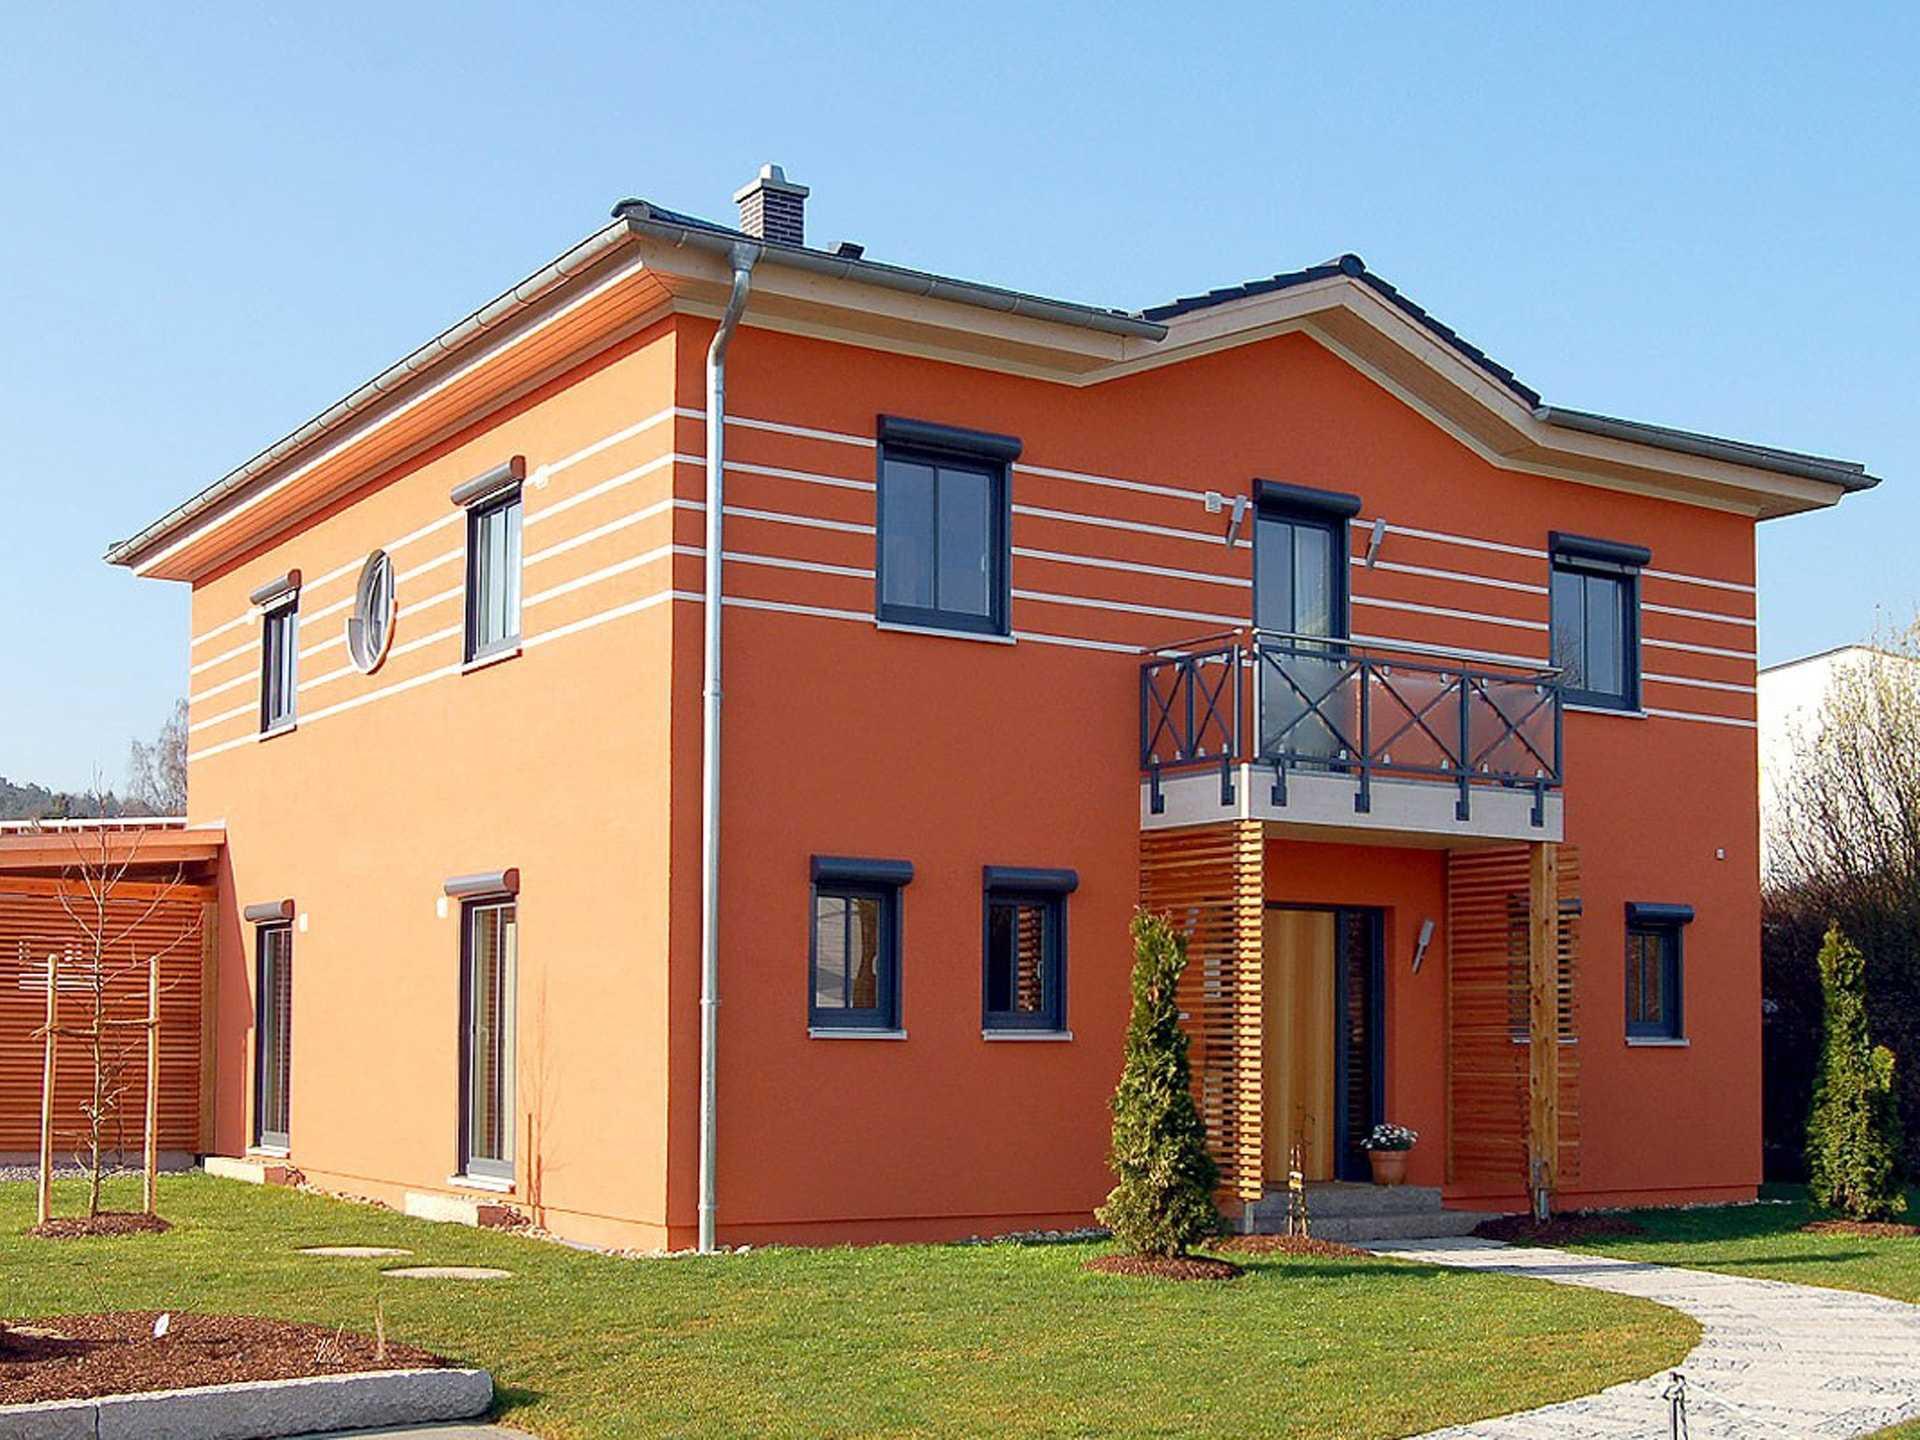 hausausstellung bodenw hr musterhauspark hausgruppe in bayern. Black Bedroom Furniture Sets. Home Design Ideas